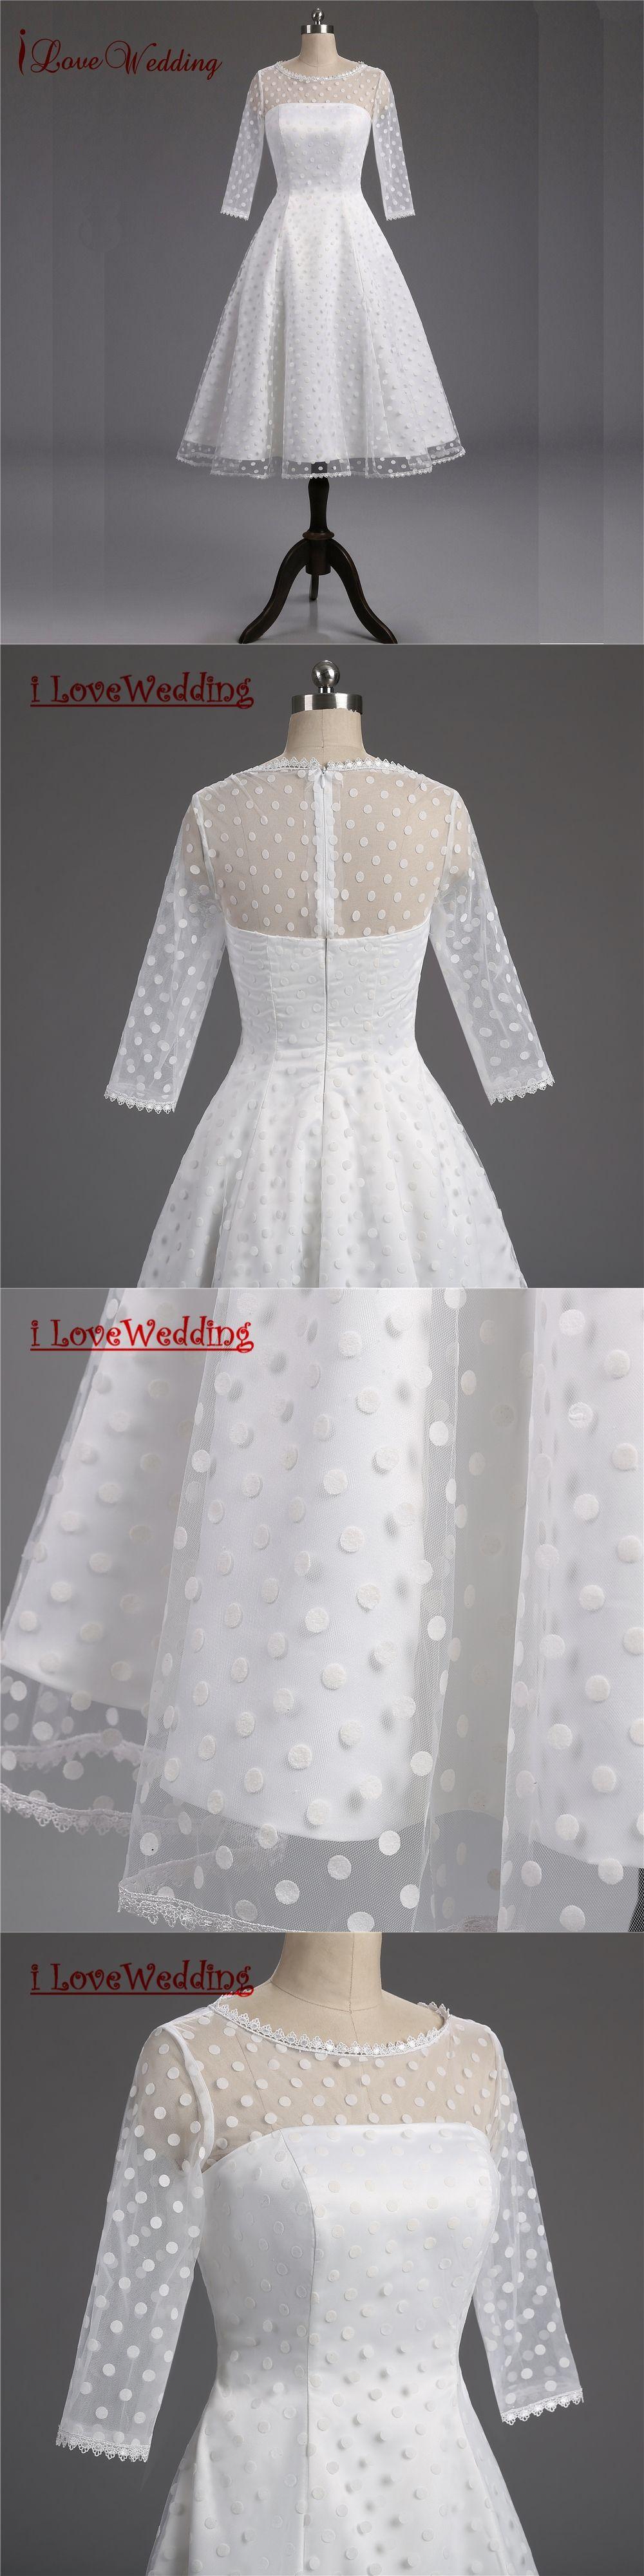 1950s style wedding dresses   Real s Retro Polka Dotted Short Wedding Dress KneeLength